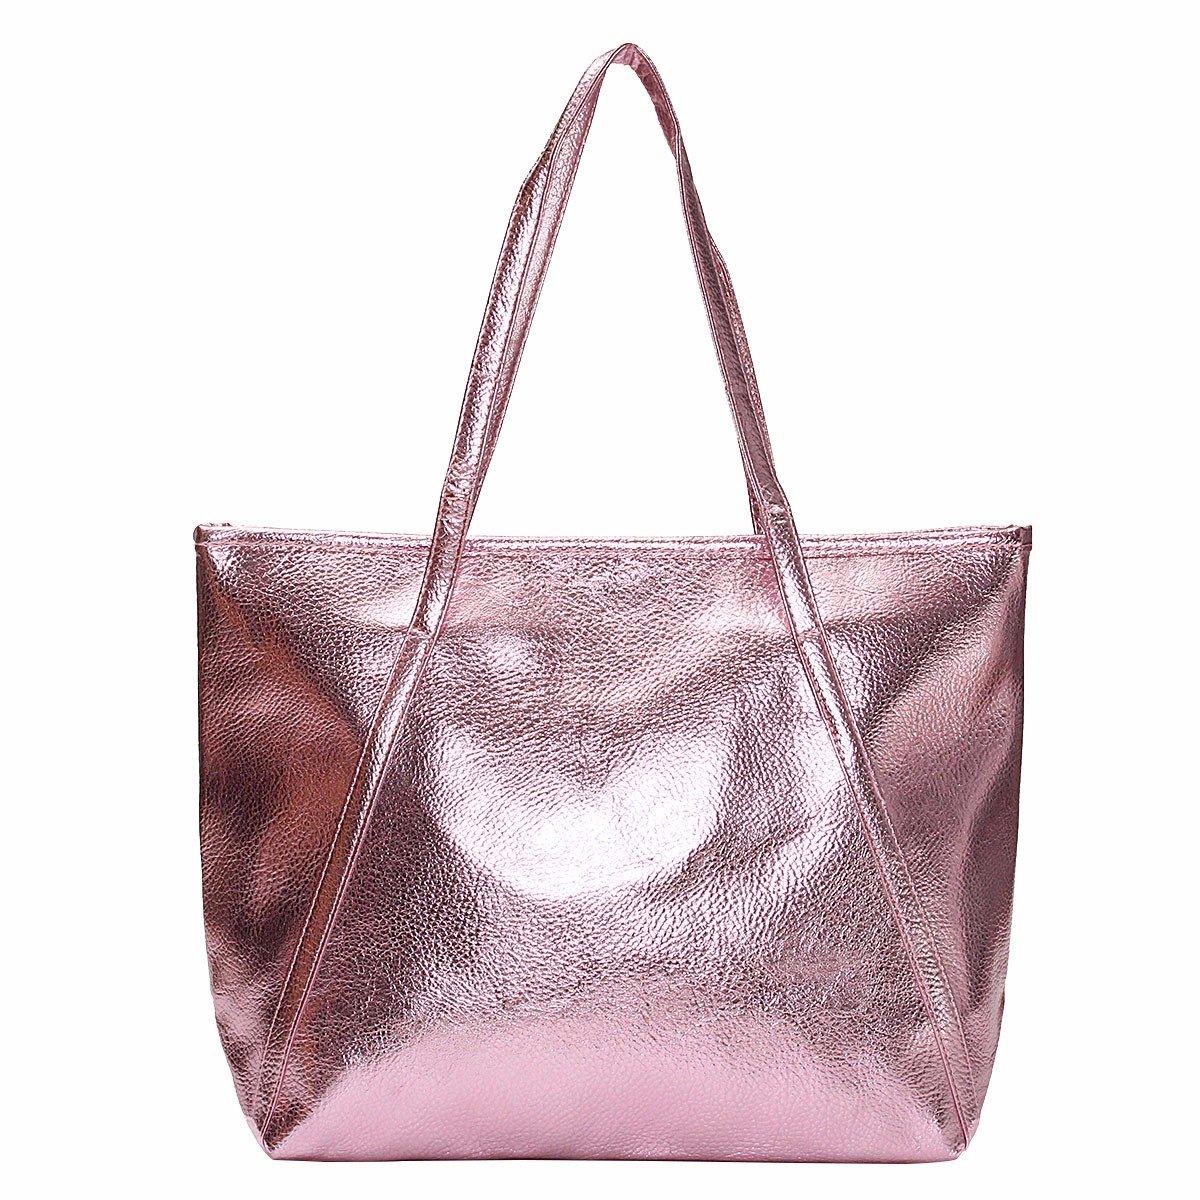 Women's Tote Handbags - OURBAG Large Fashion Designer Elegant Shoulder Bag Purses for Ladies Pink by OURBAG